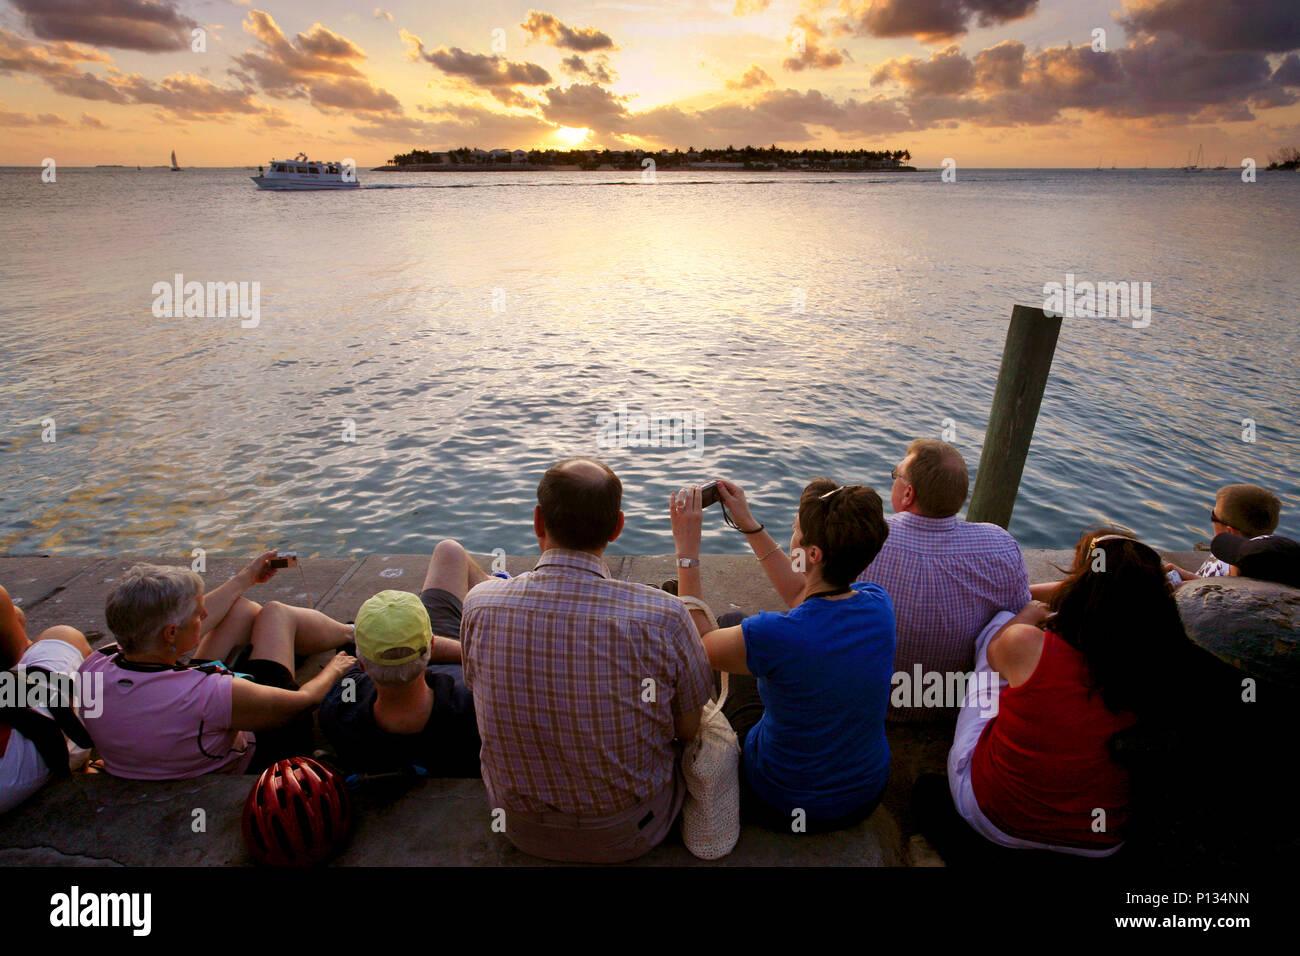 Regardant le soleil se coucher, Mallory Square, Key West, Floride, USA Photo Stock